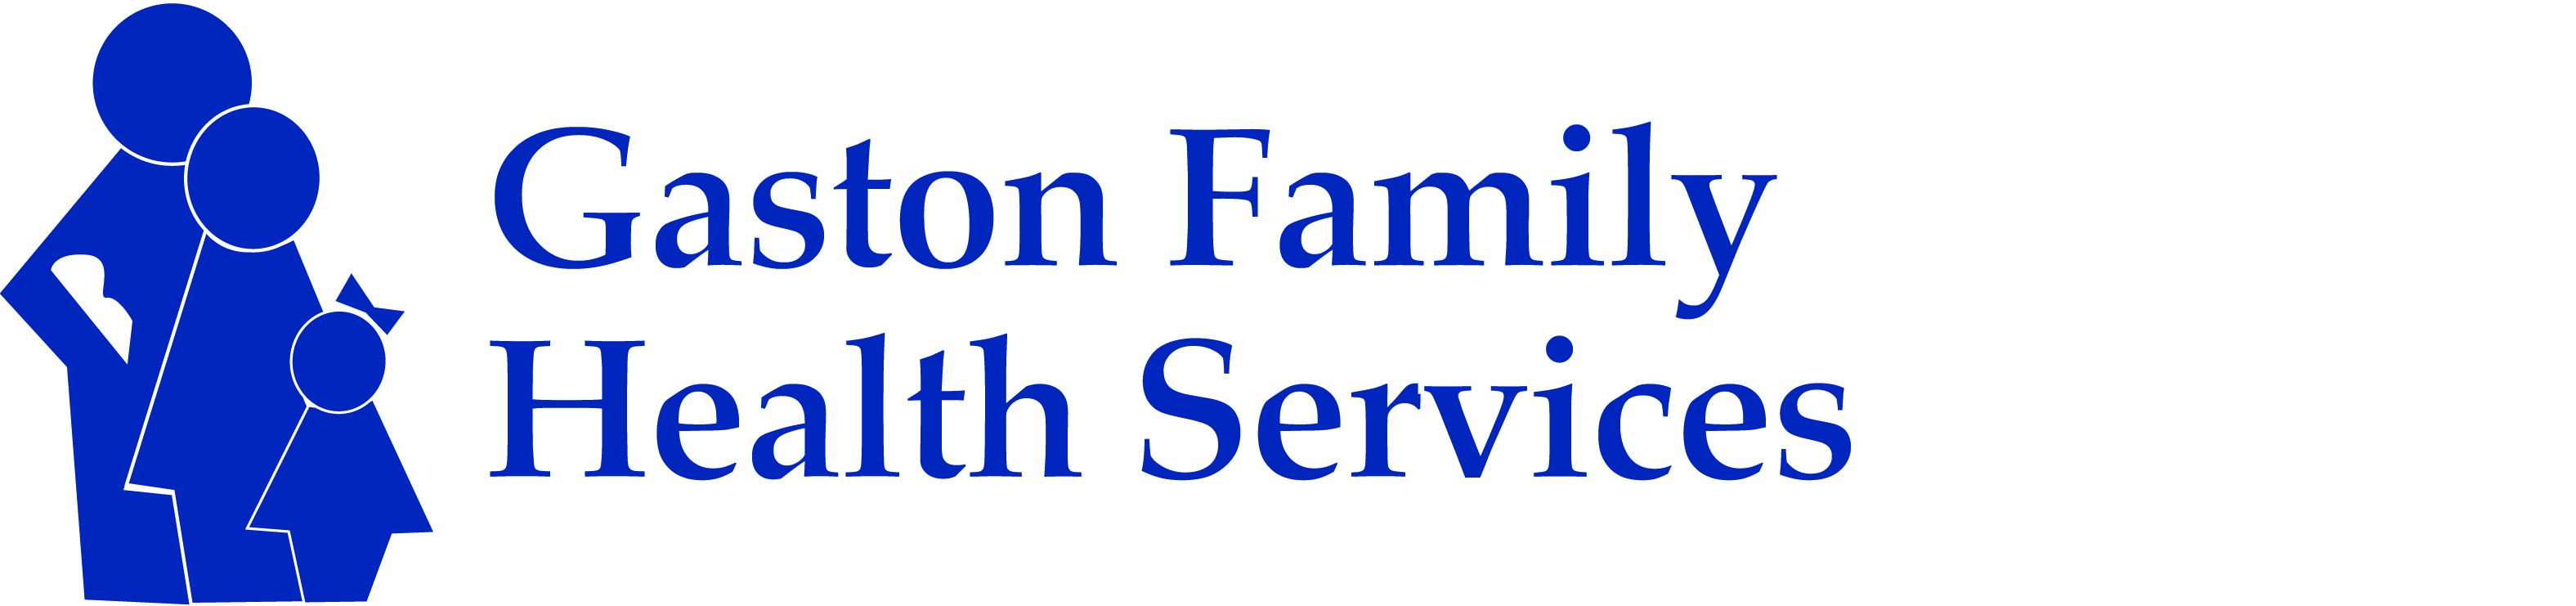 Gaston Family Health Services